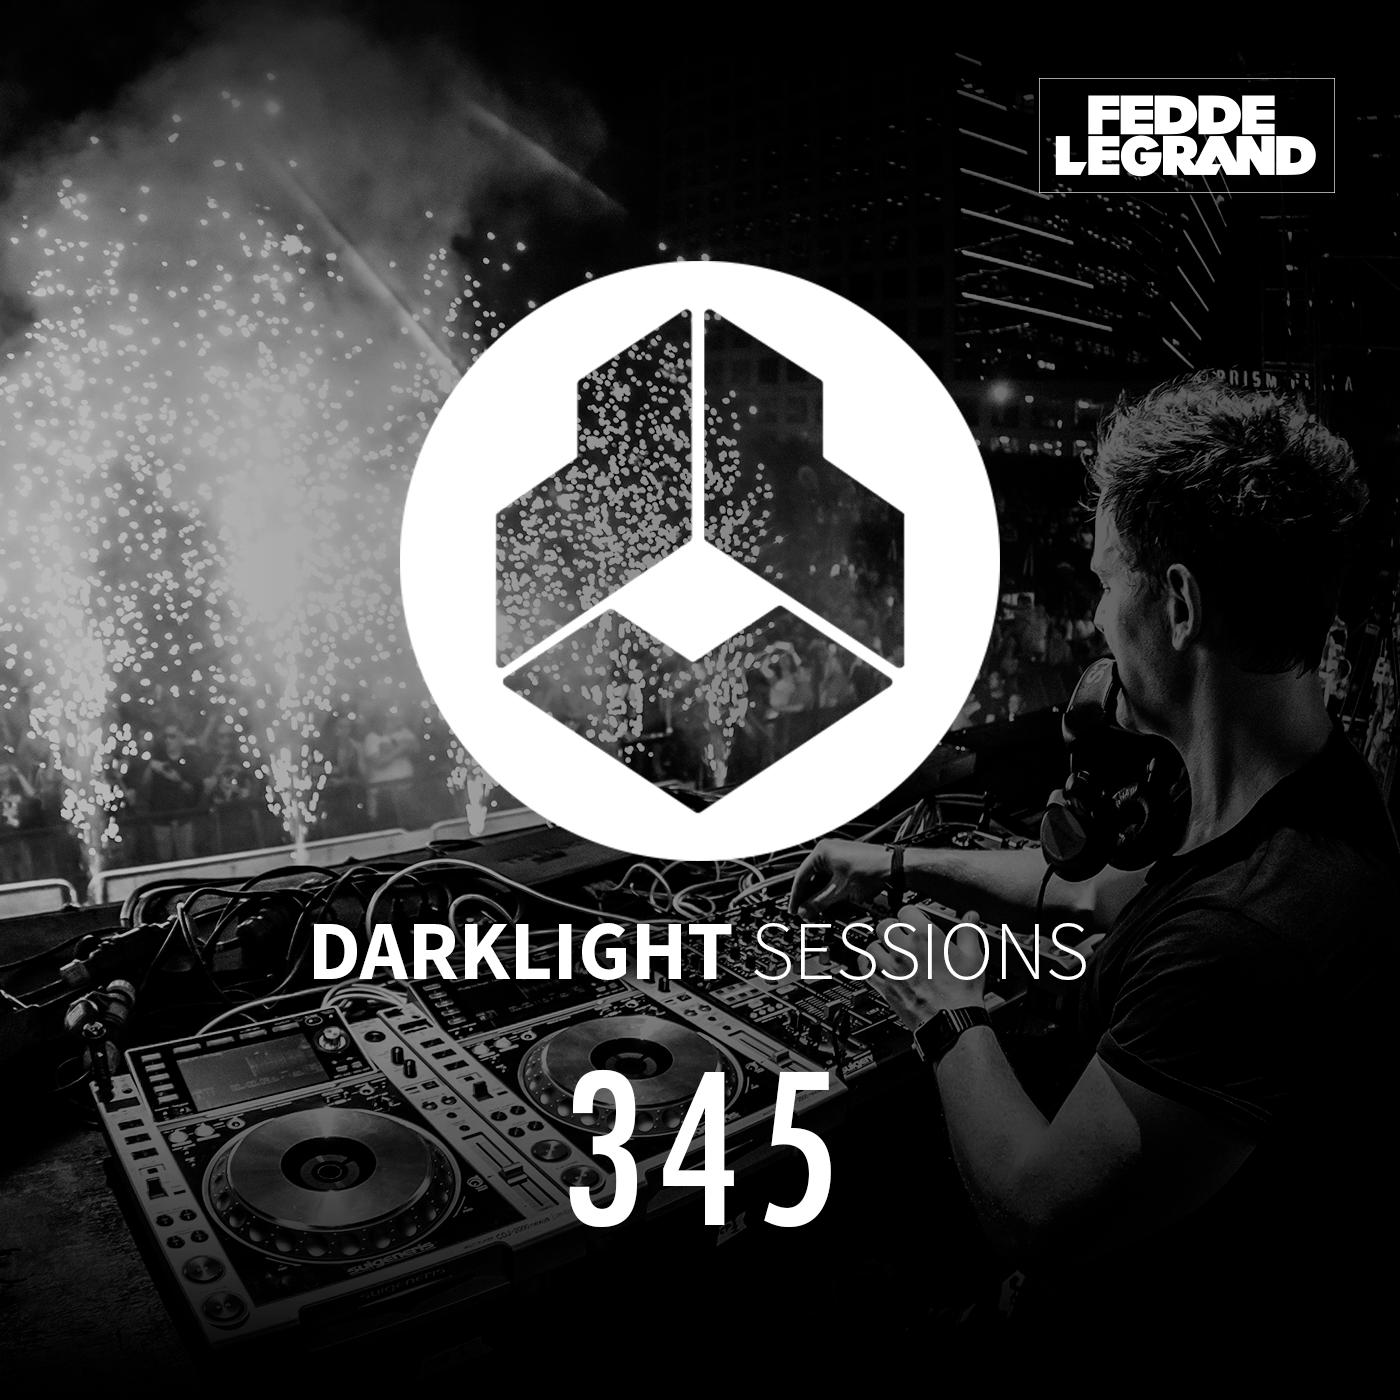 Darklight Sessions 345